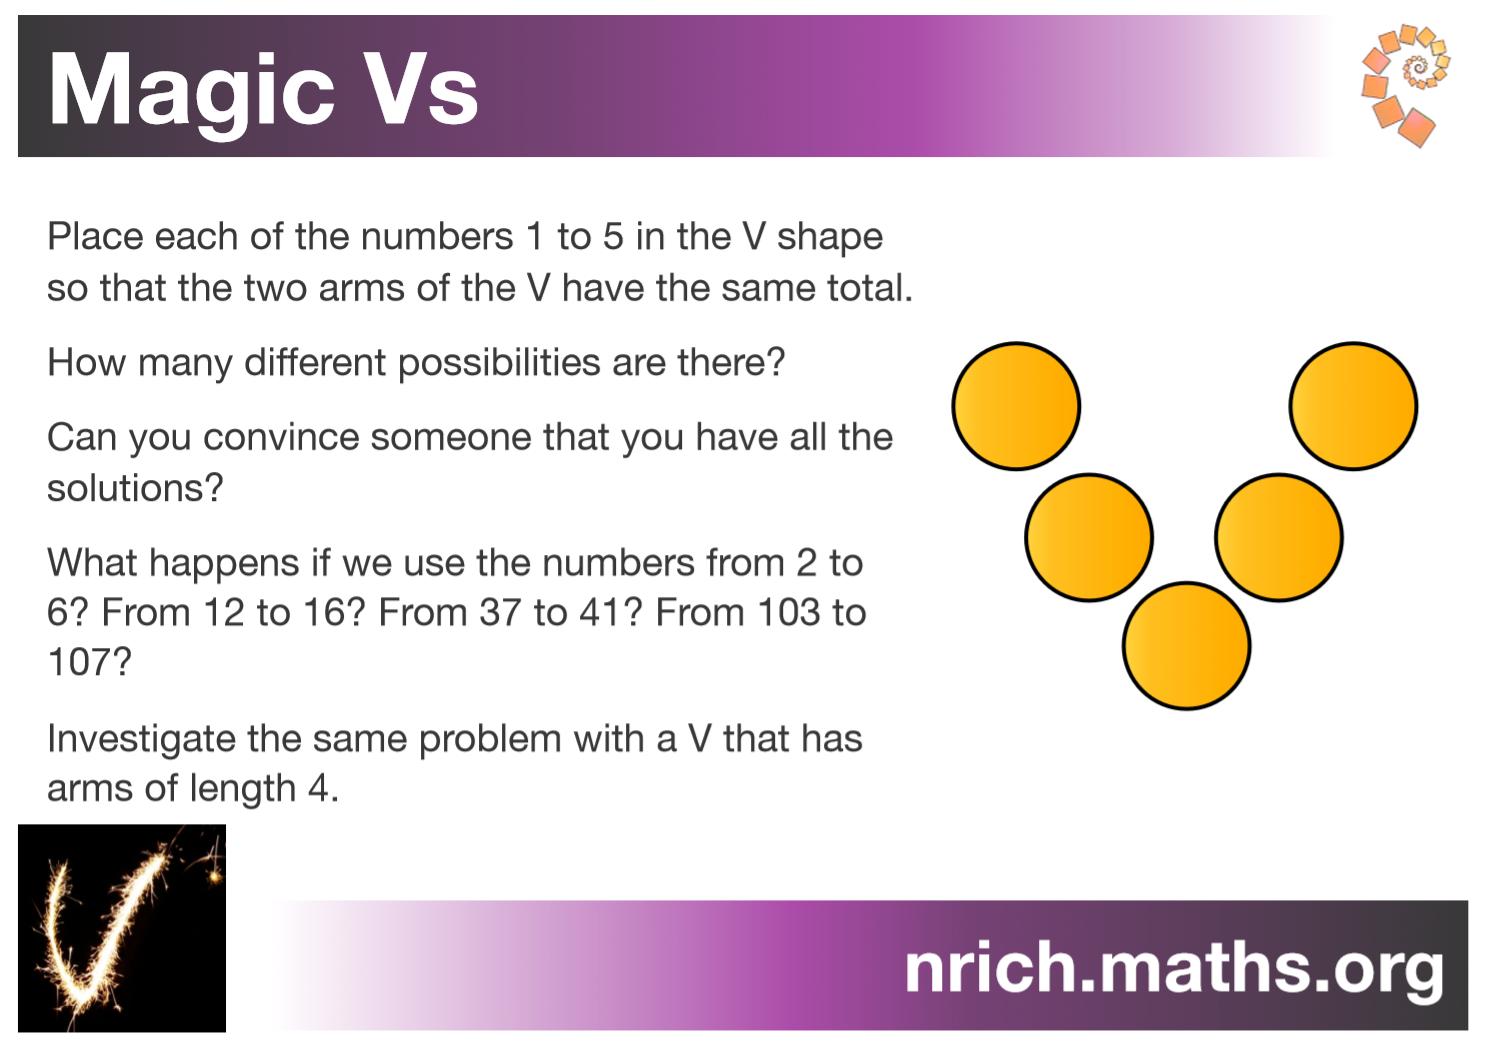 Magic Vs Poster : nrich.maths.org